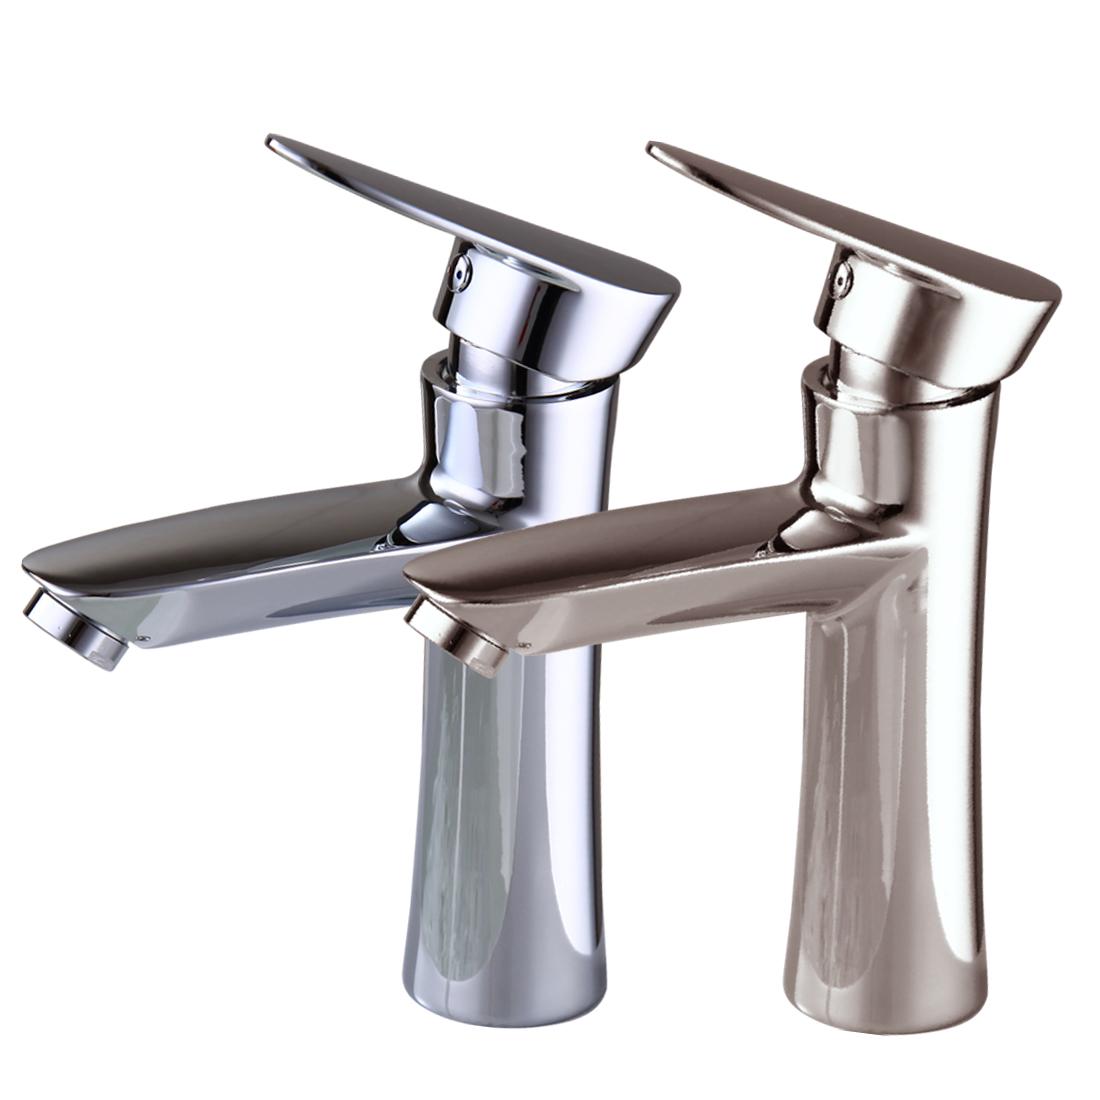 Oil Rubbed Bronze Modern Bathroom Faucet Widespread Sink ...